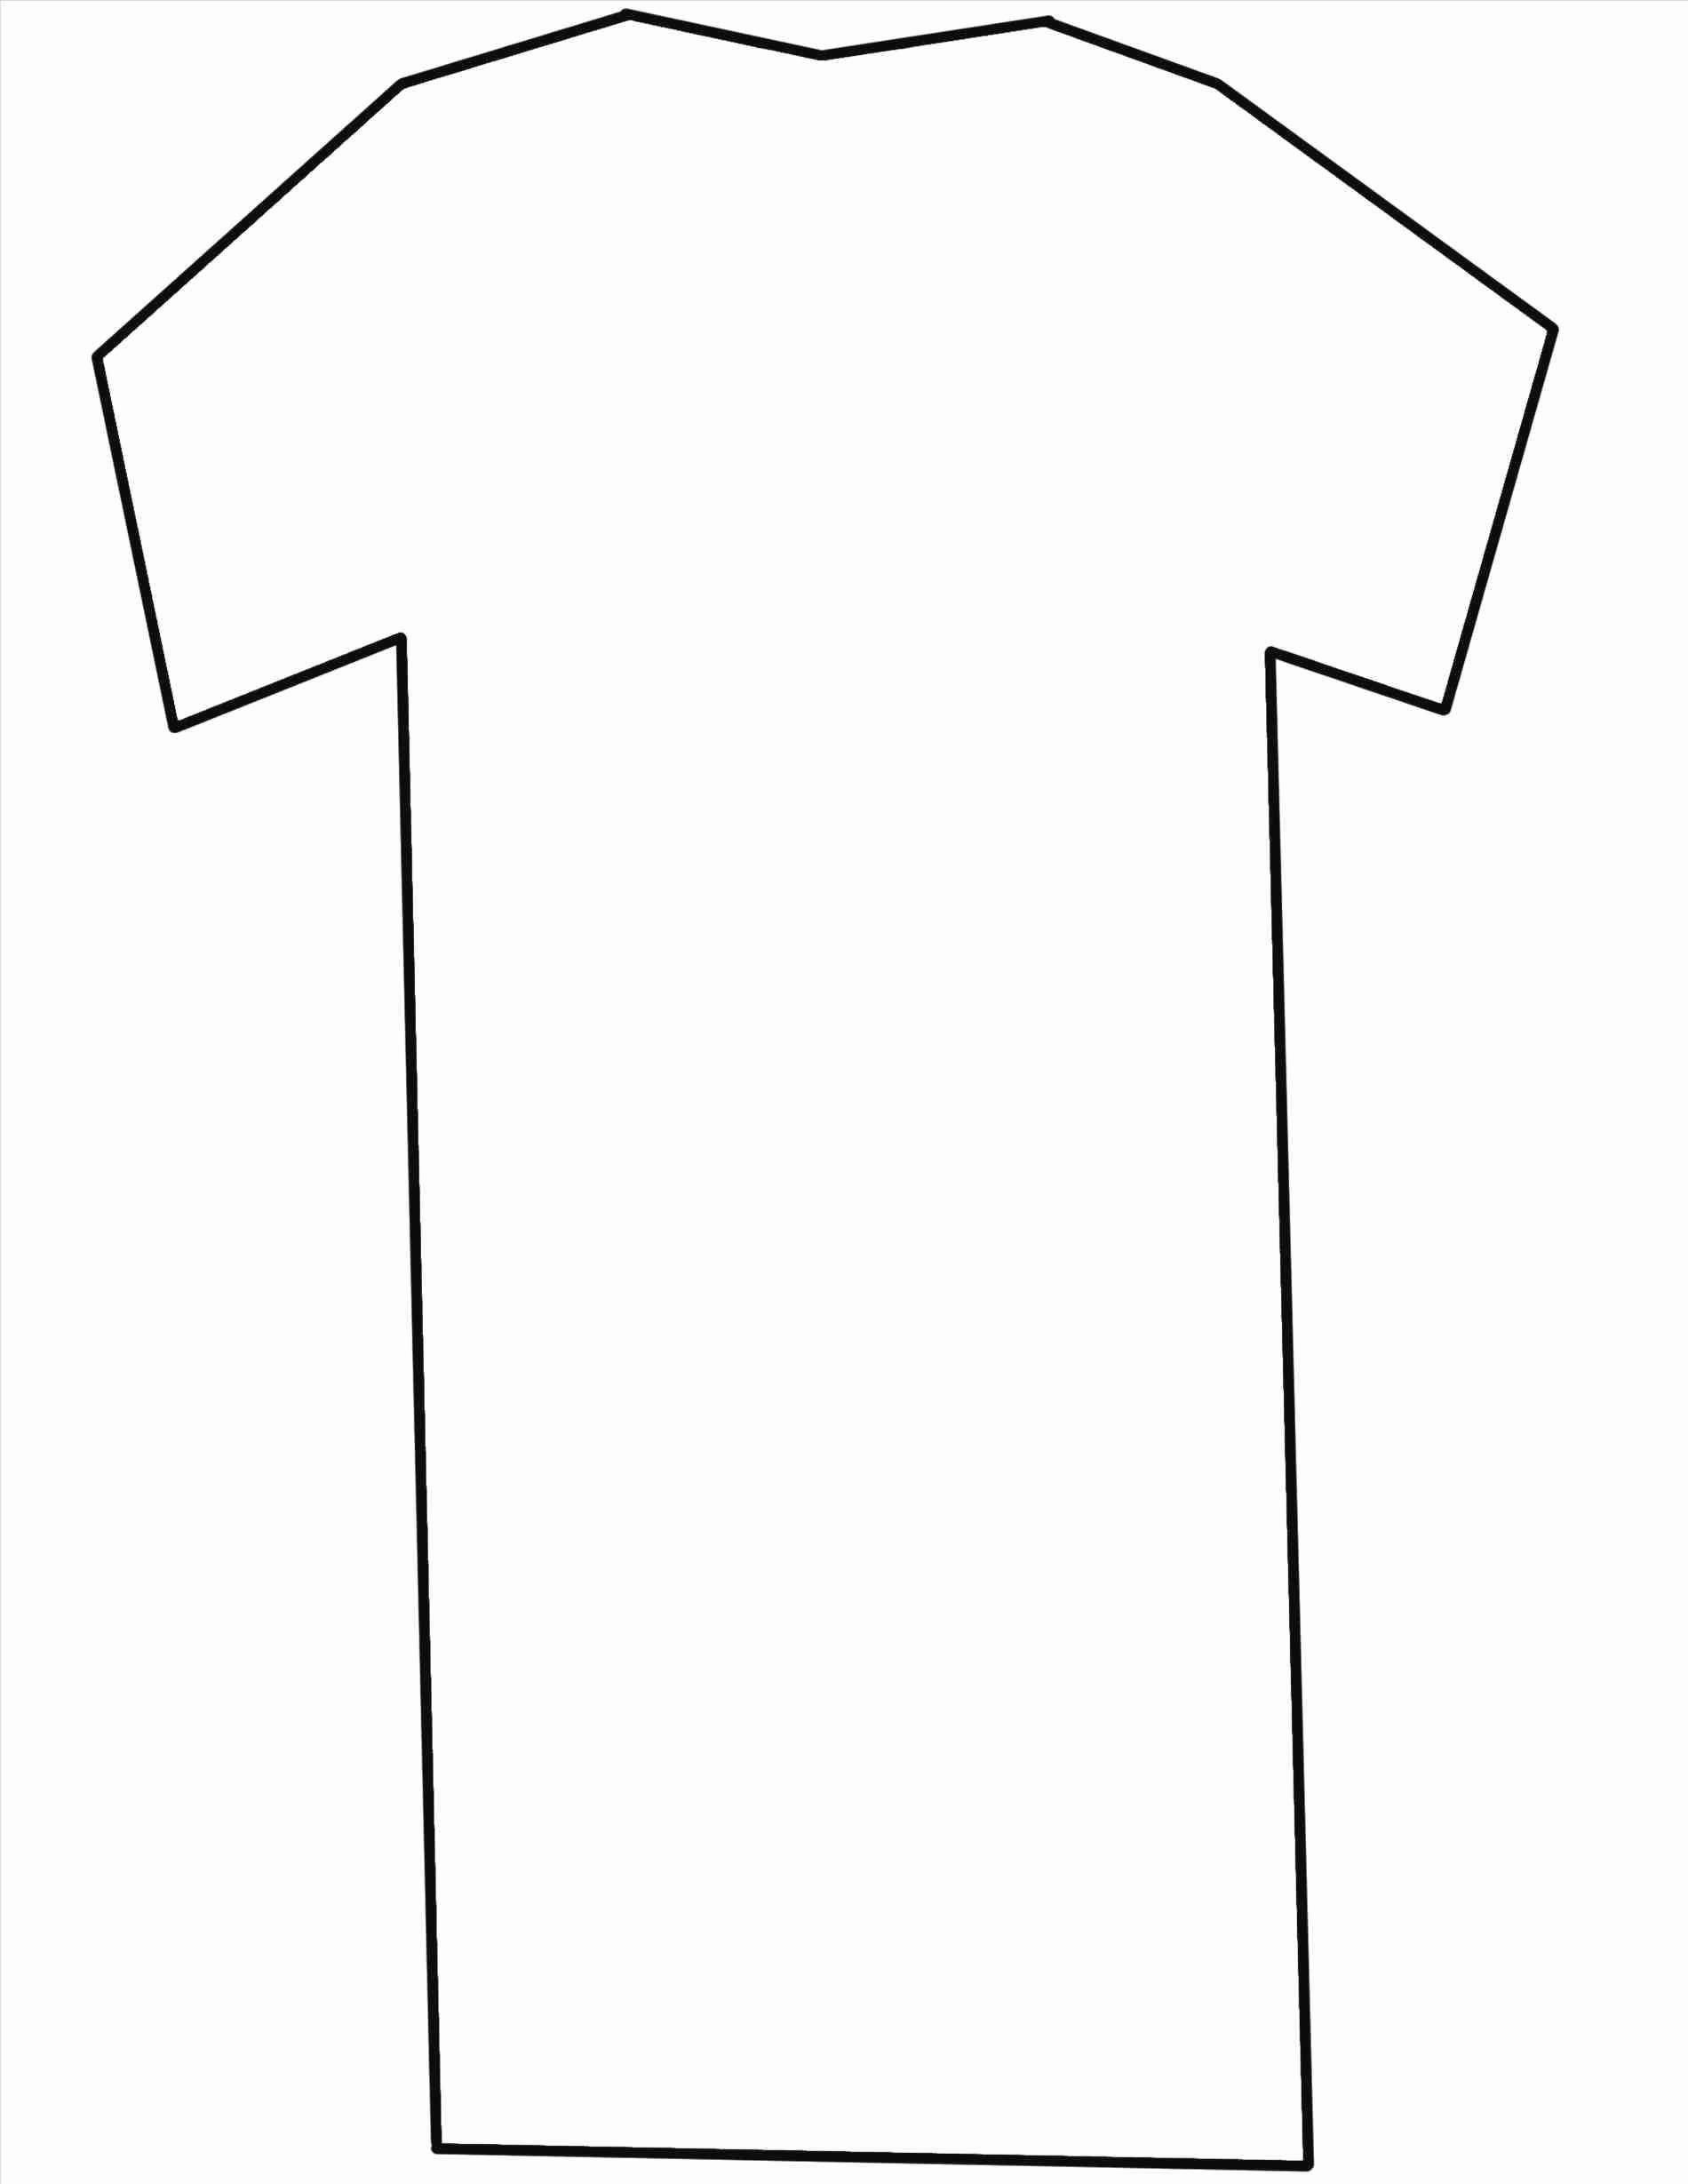 T Shirt Template Pdf New Inspirational T Shirt Design Template Pdf